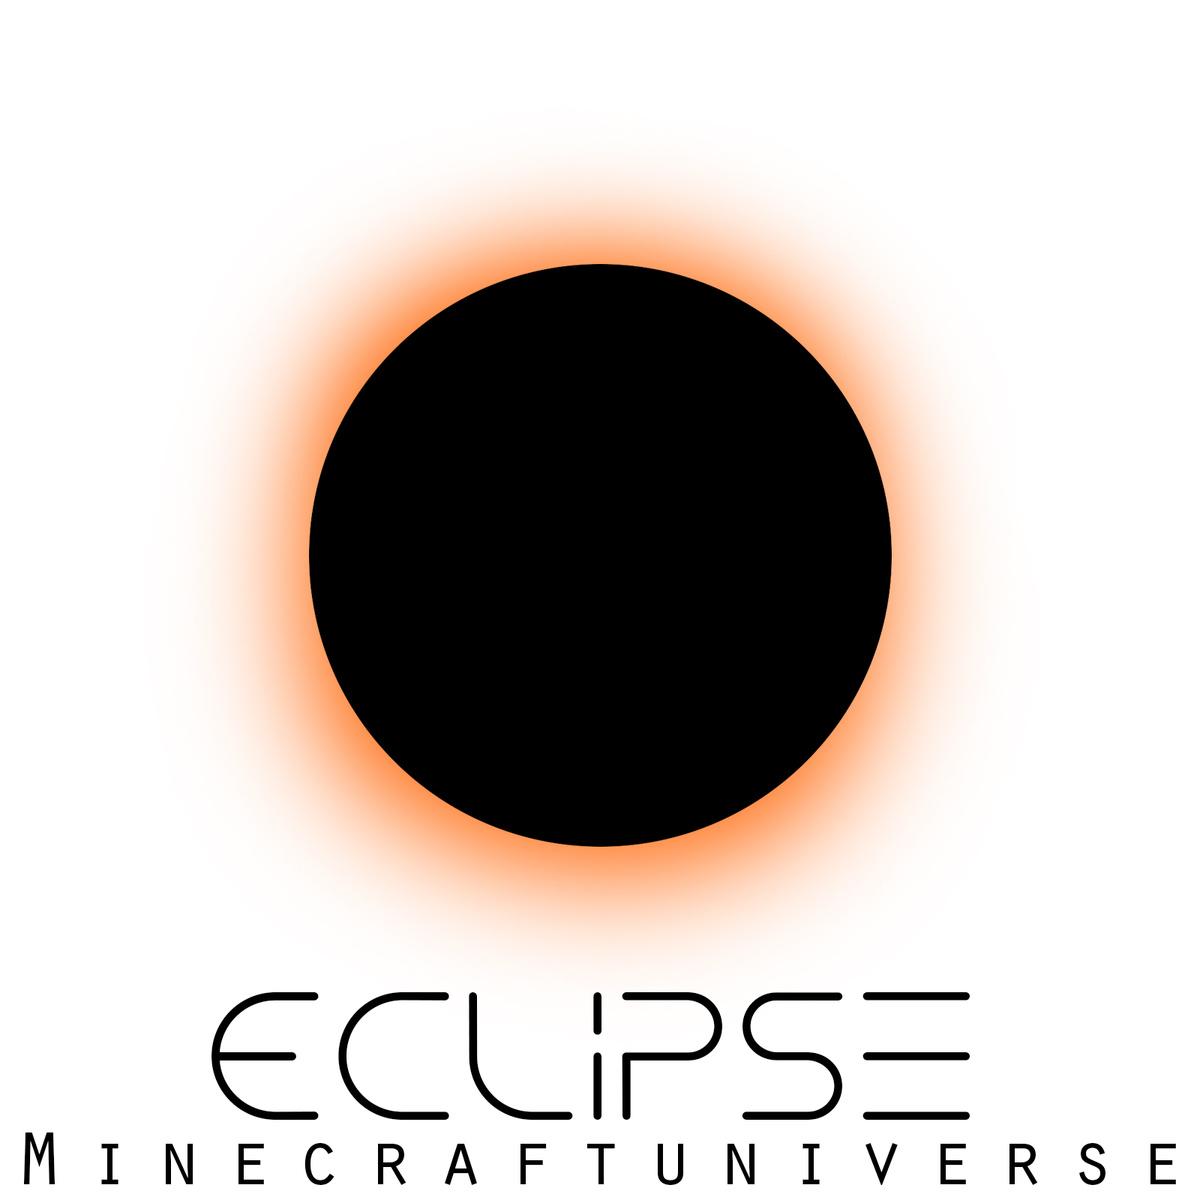 MinecraftUniverse